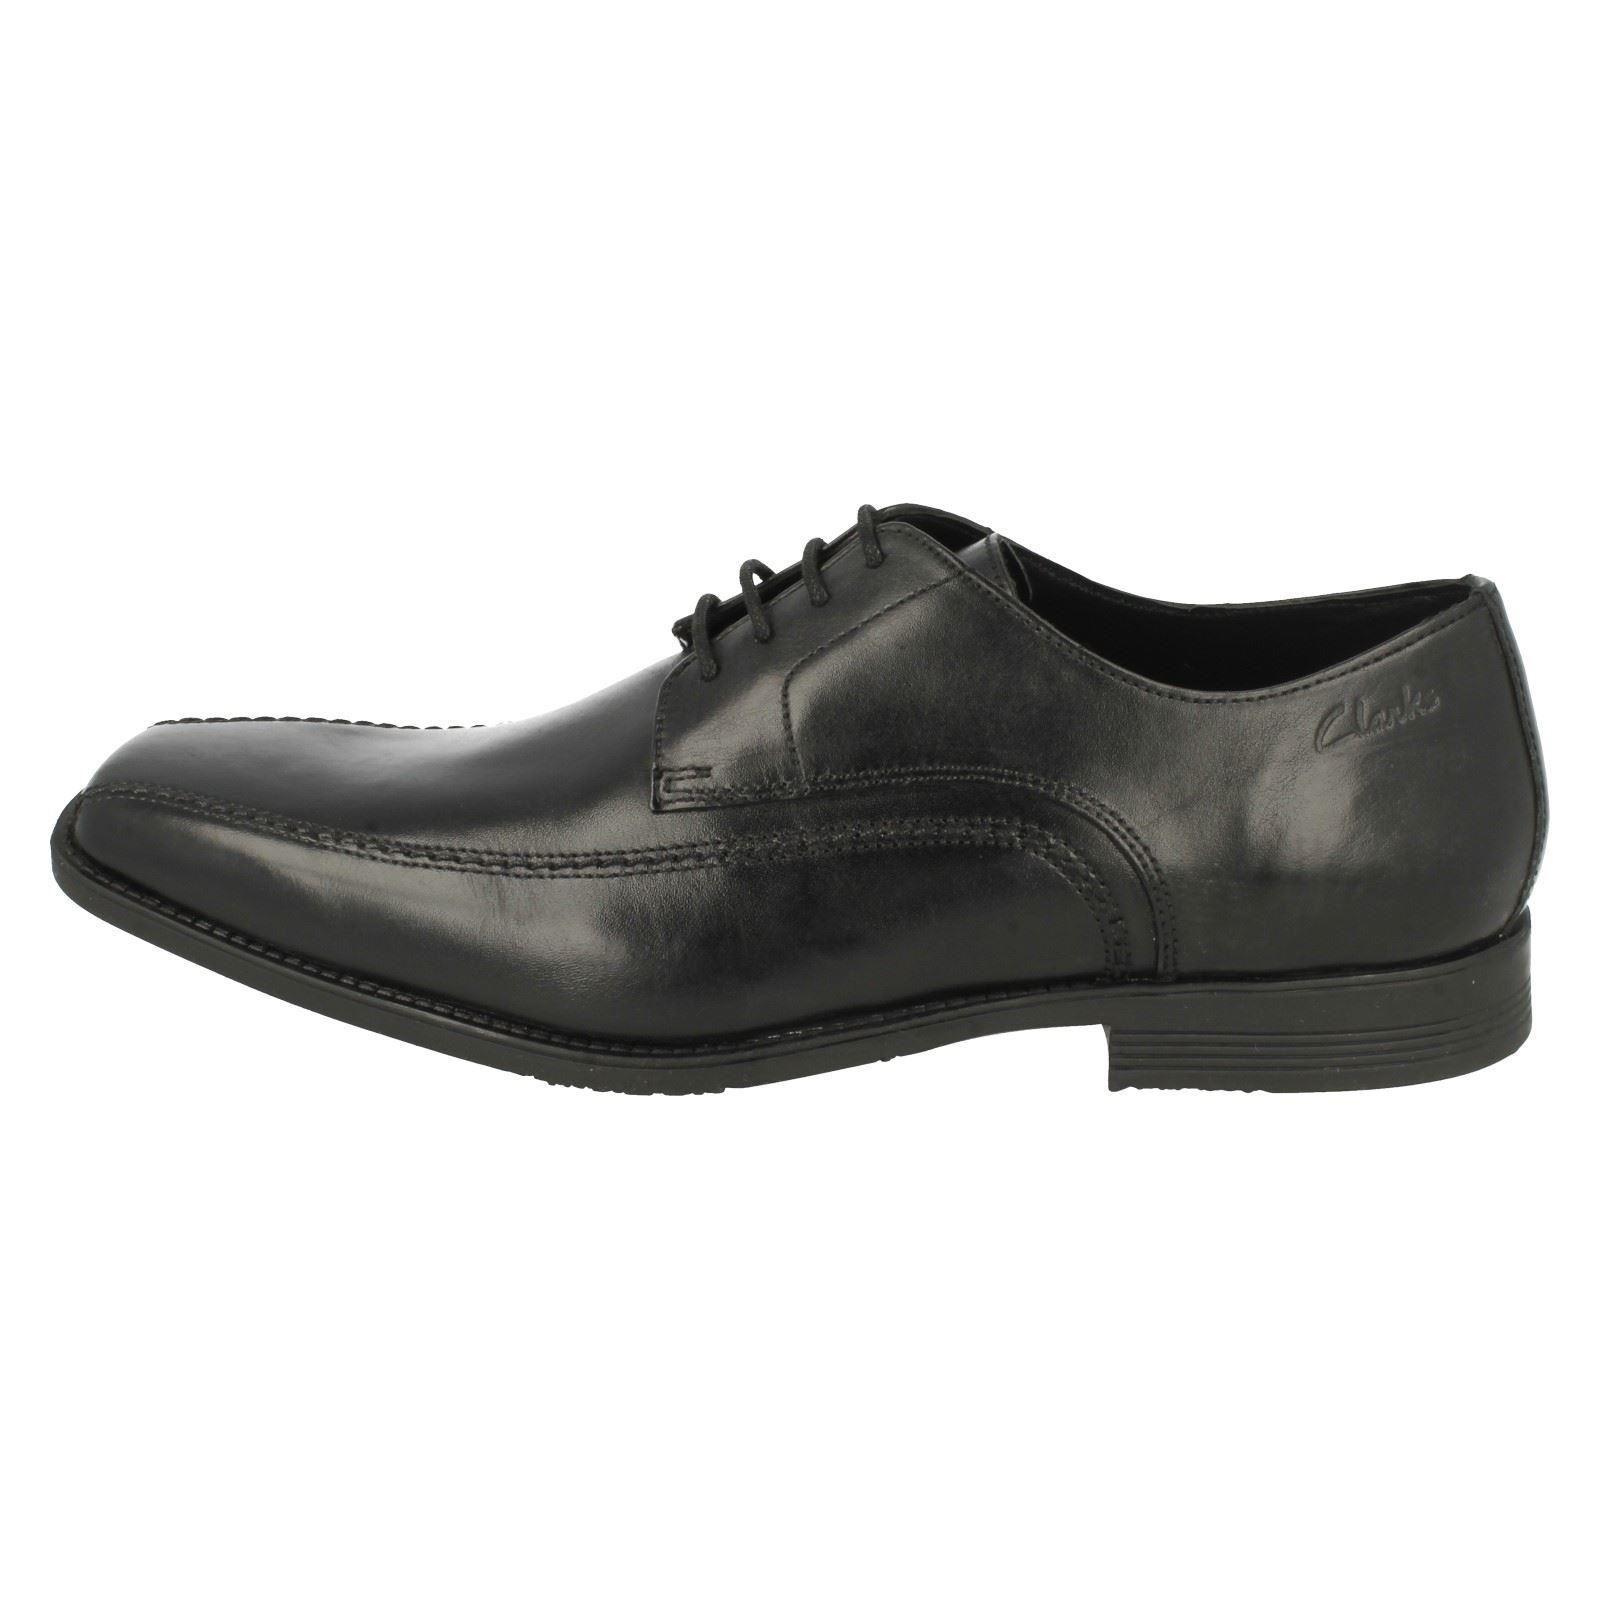 Herren Herren Herren Clarks G PASSFORM zum Schnüren Schuhe - Baker Spitze  bf4819